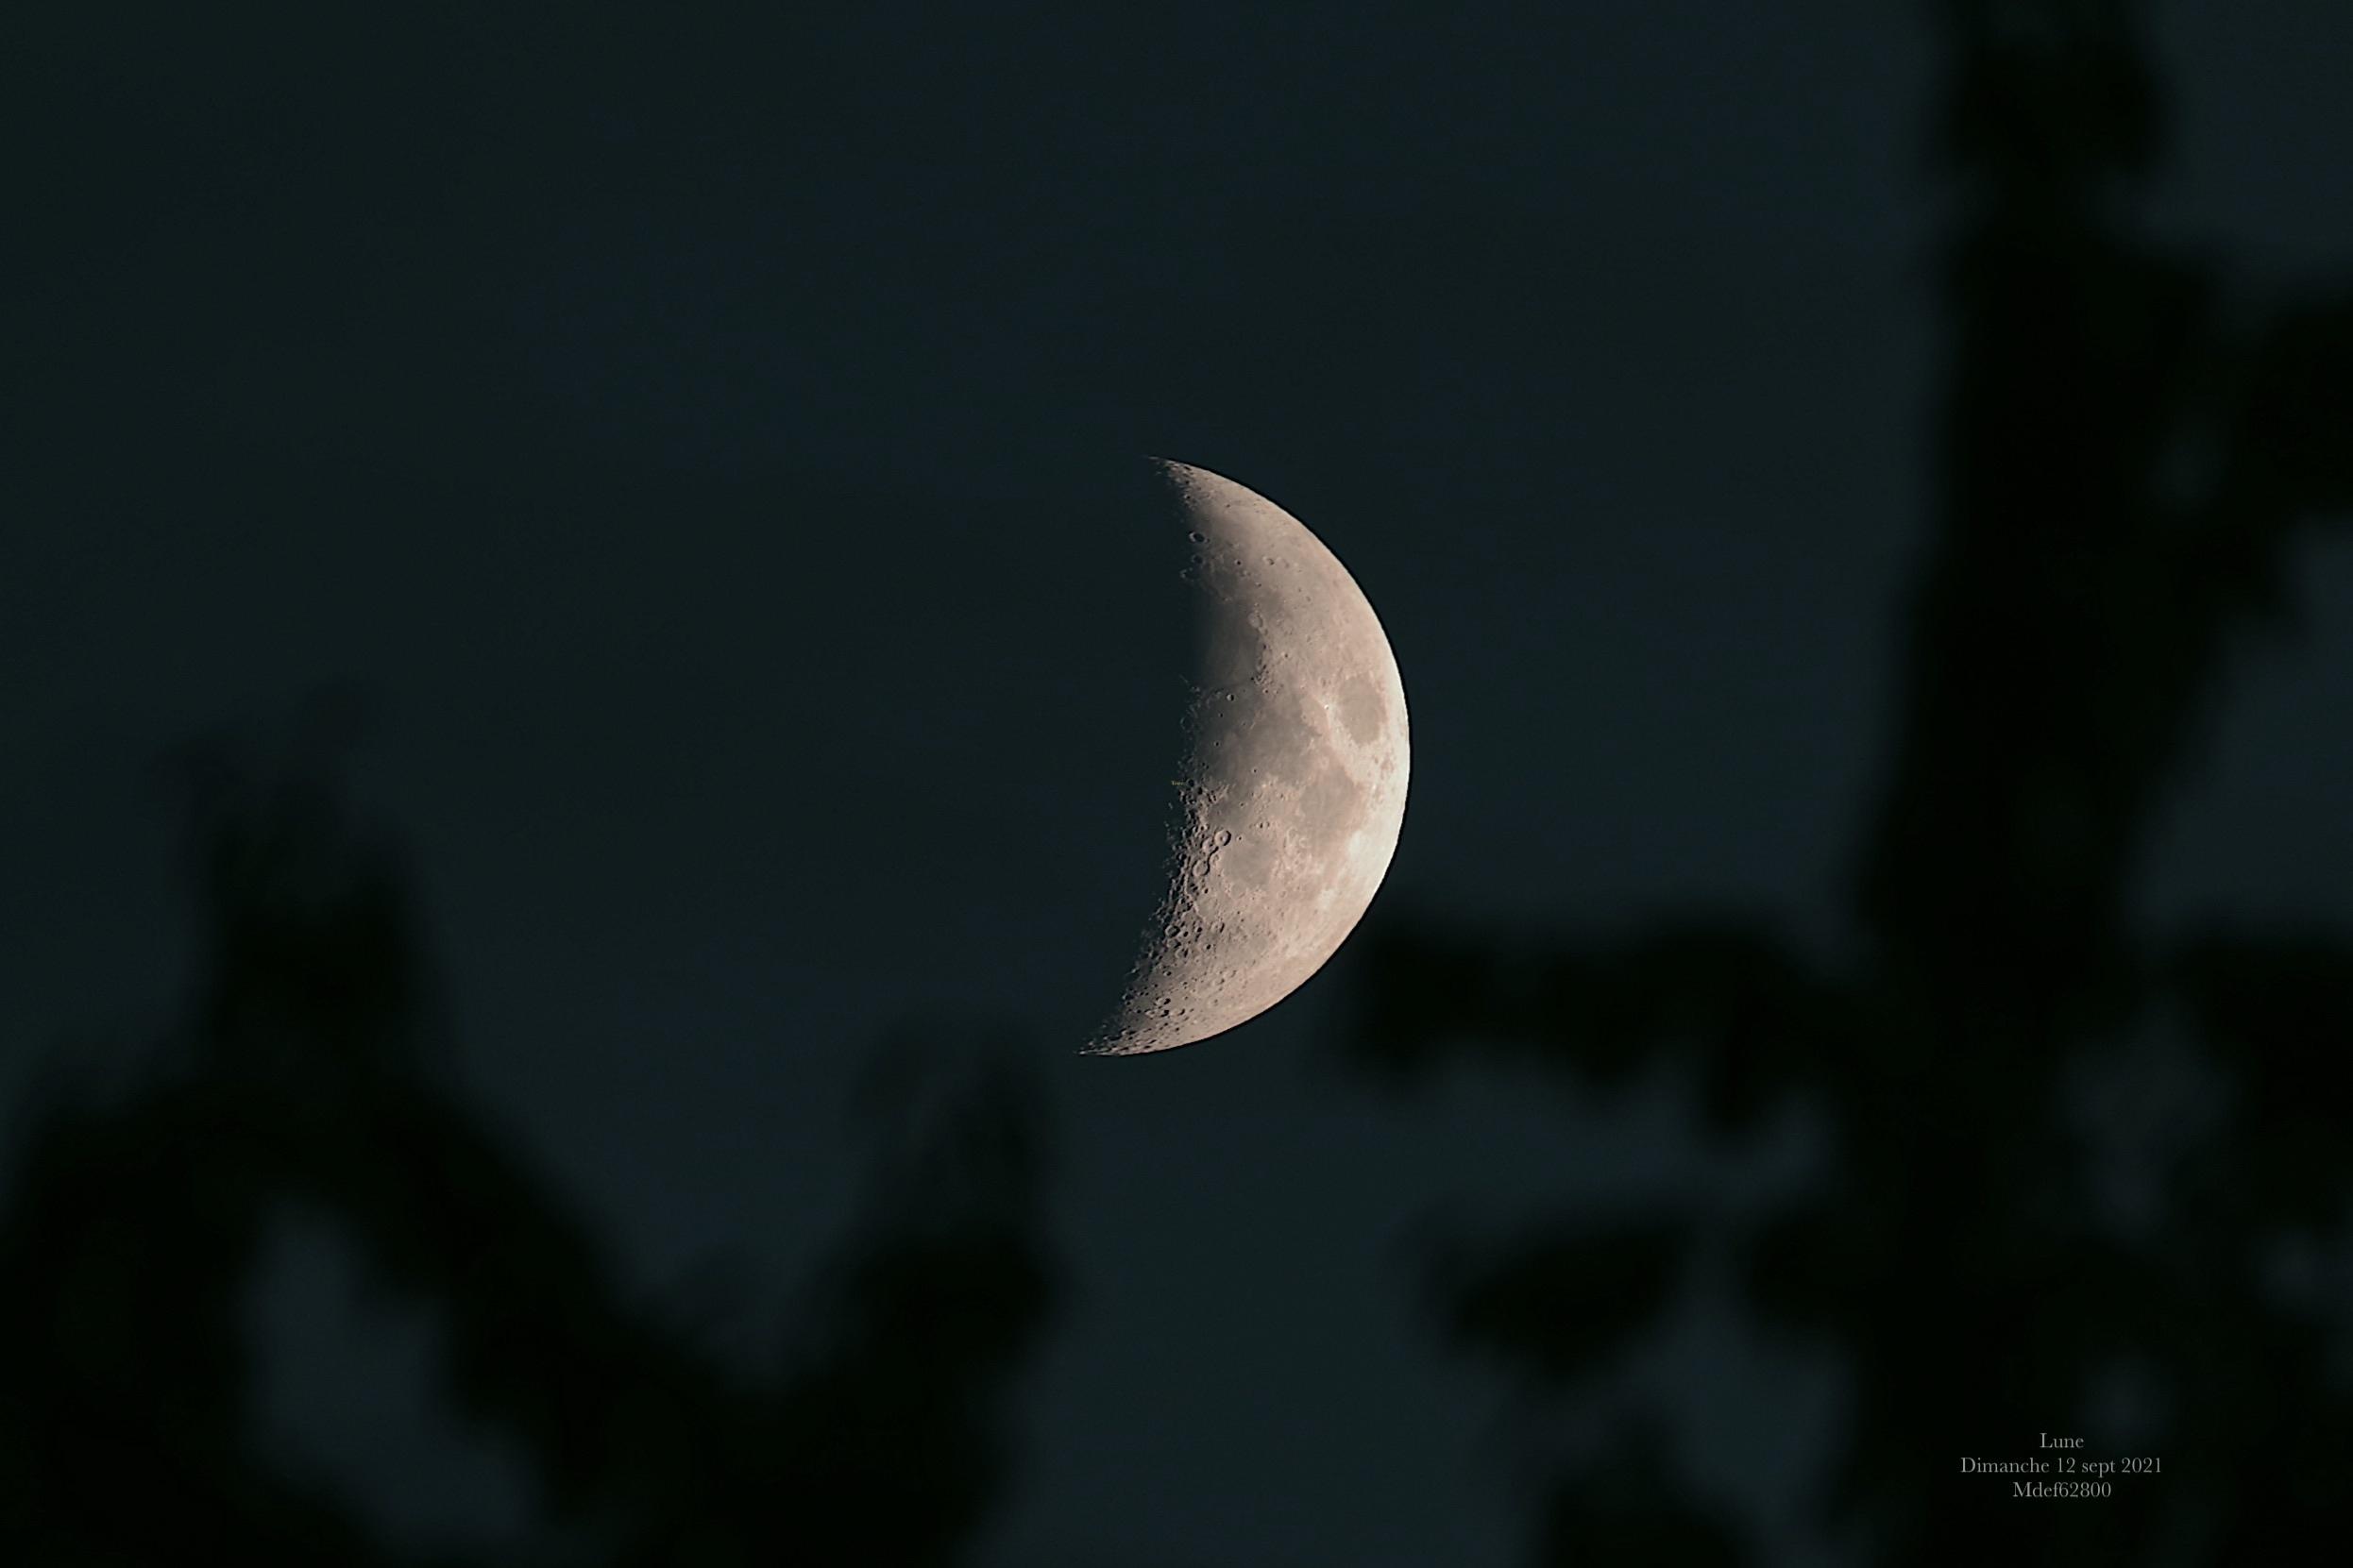 Lune  12 sept  2021